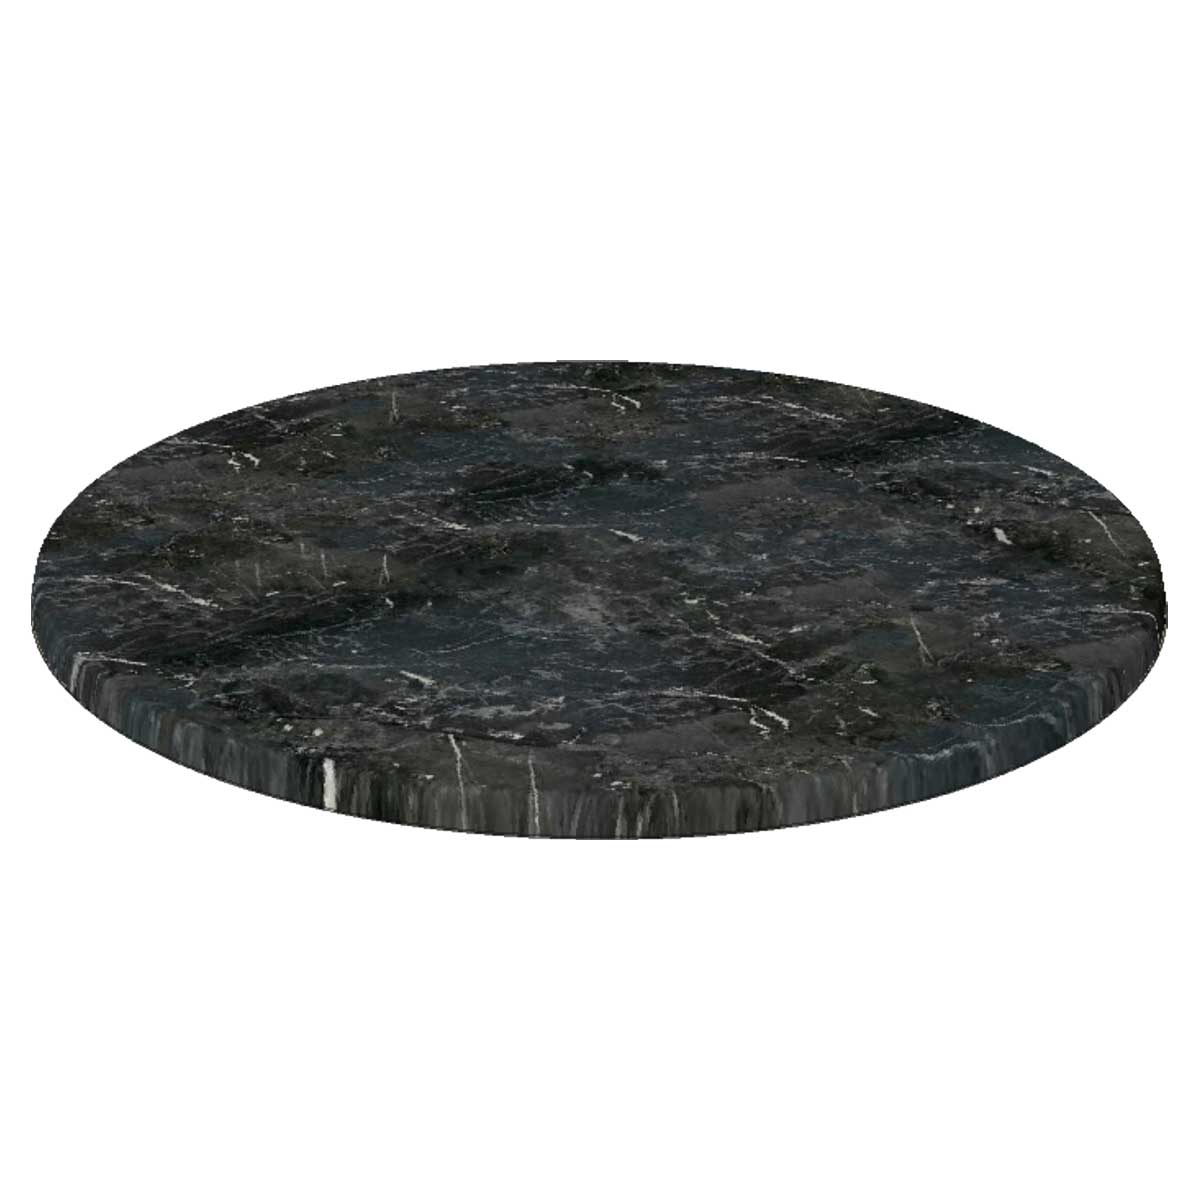 TICLA R70 210 - https://www.werzalit.com/en/product/table-top-classic-werzalit-r-oe70-210-marmor-marquina/